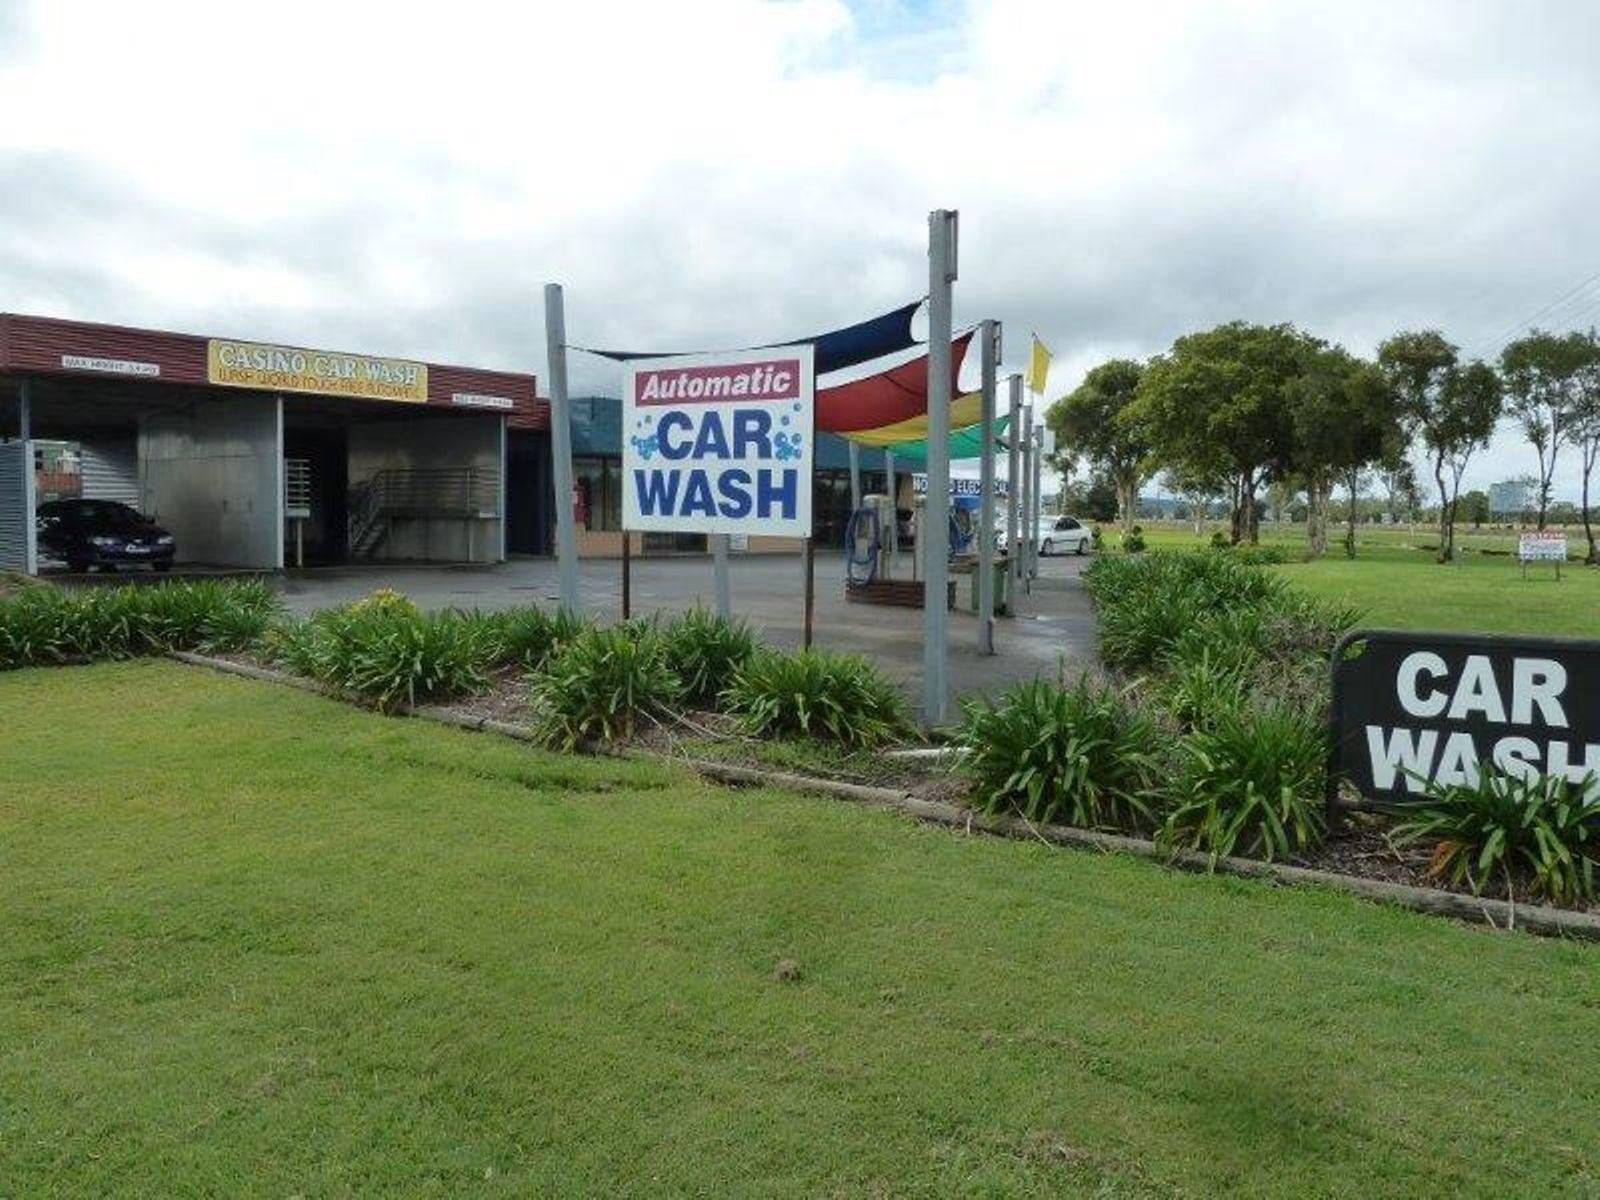 1 Cassino Drive, Casino, NSW 2470